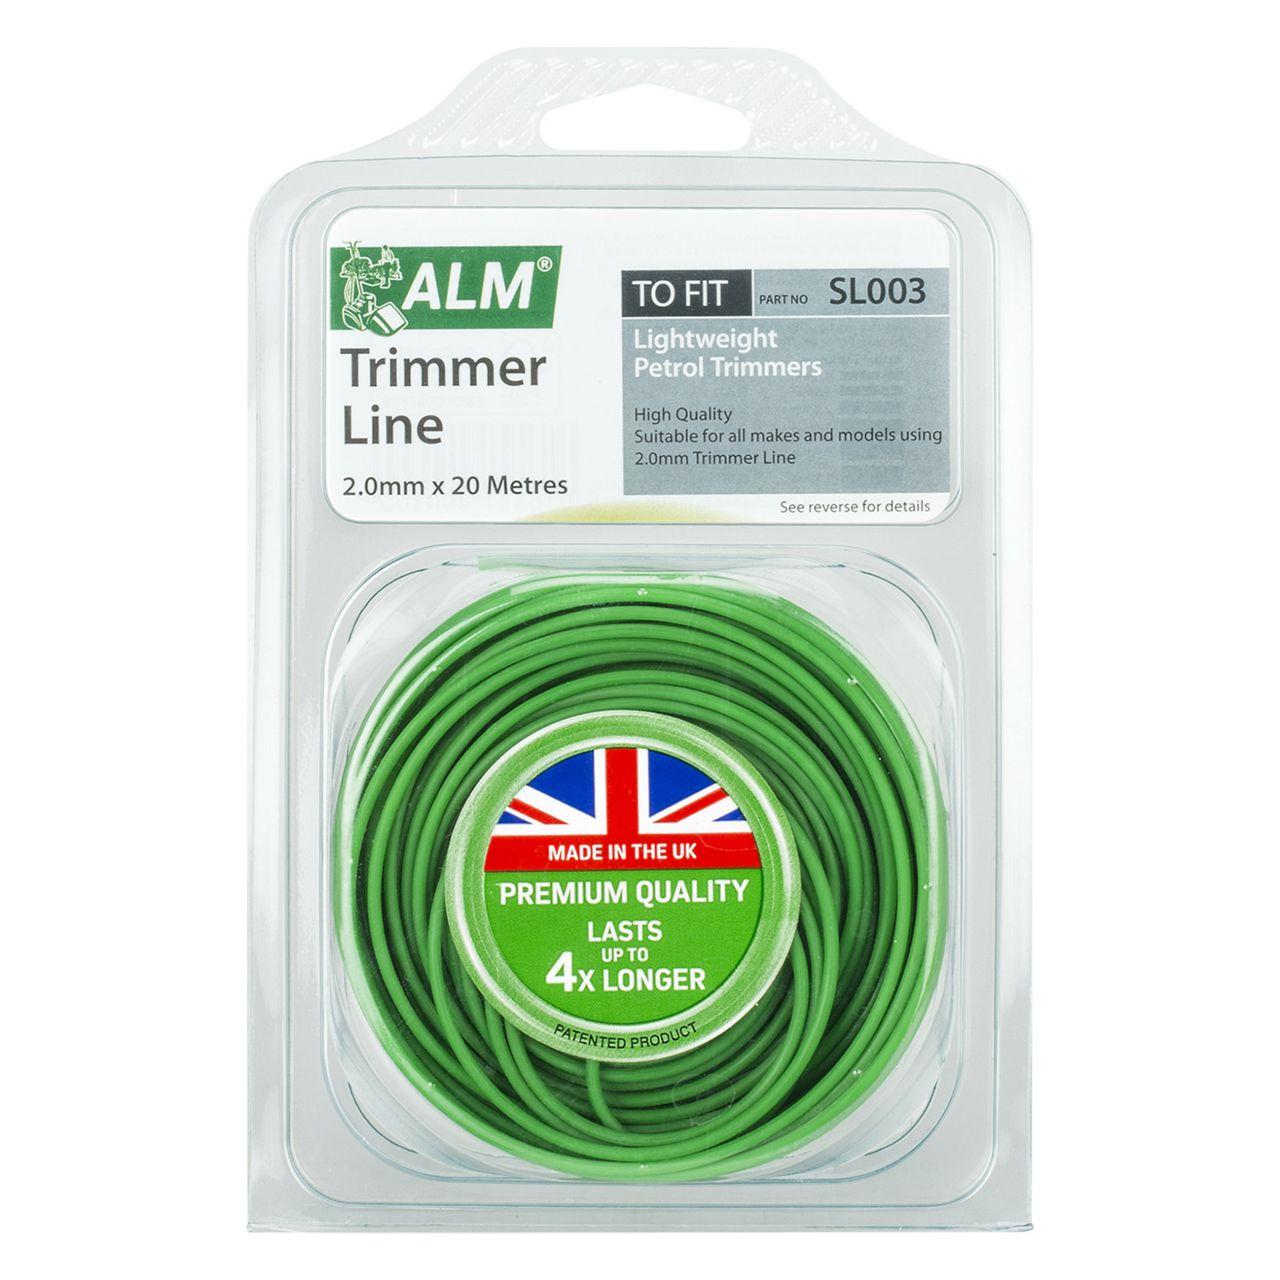 https://handycabin.co.uk/wp-content/uploads/product/5016531400306.jpg